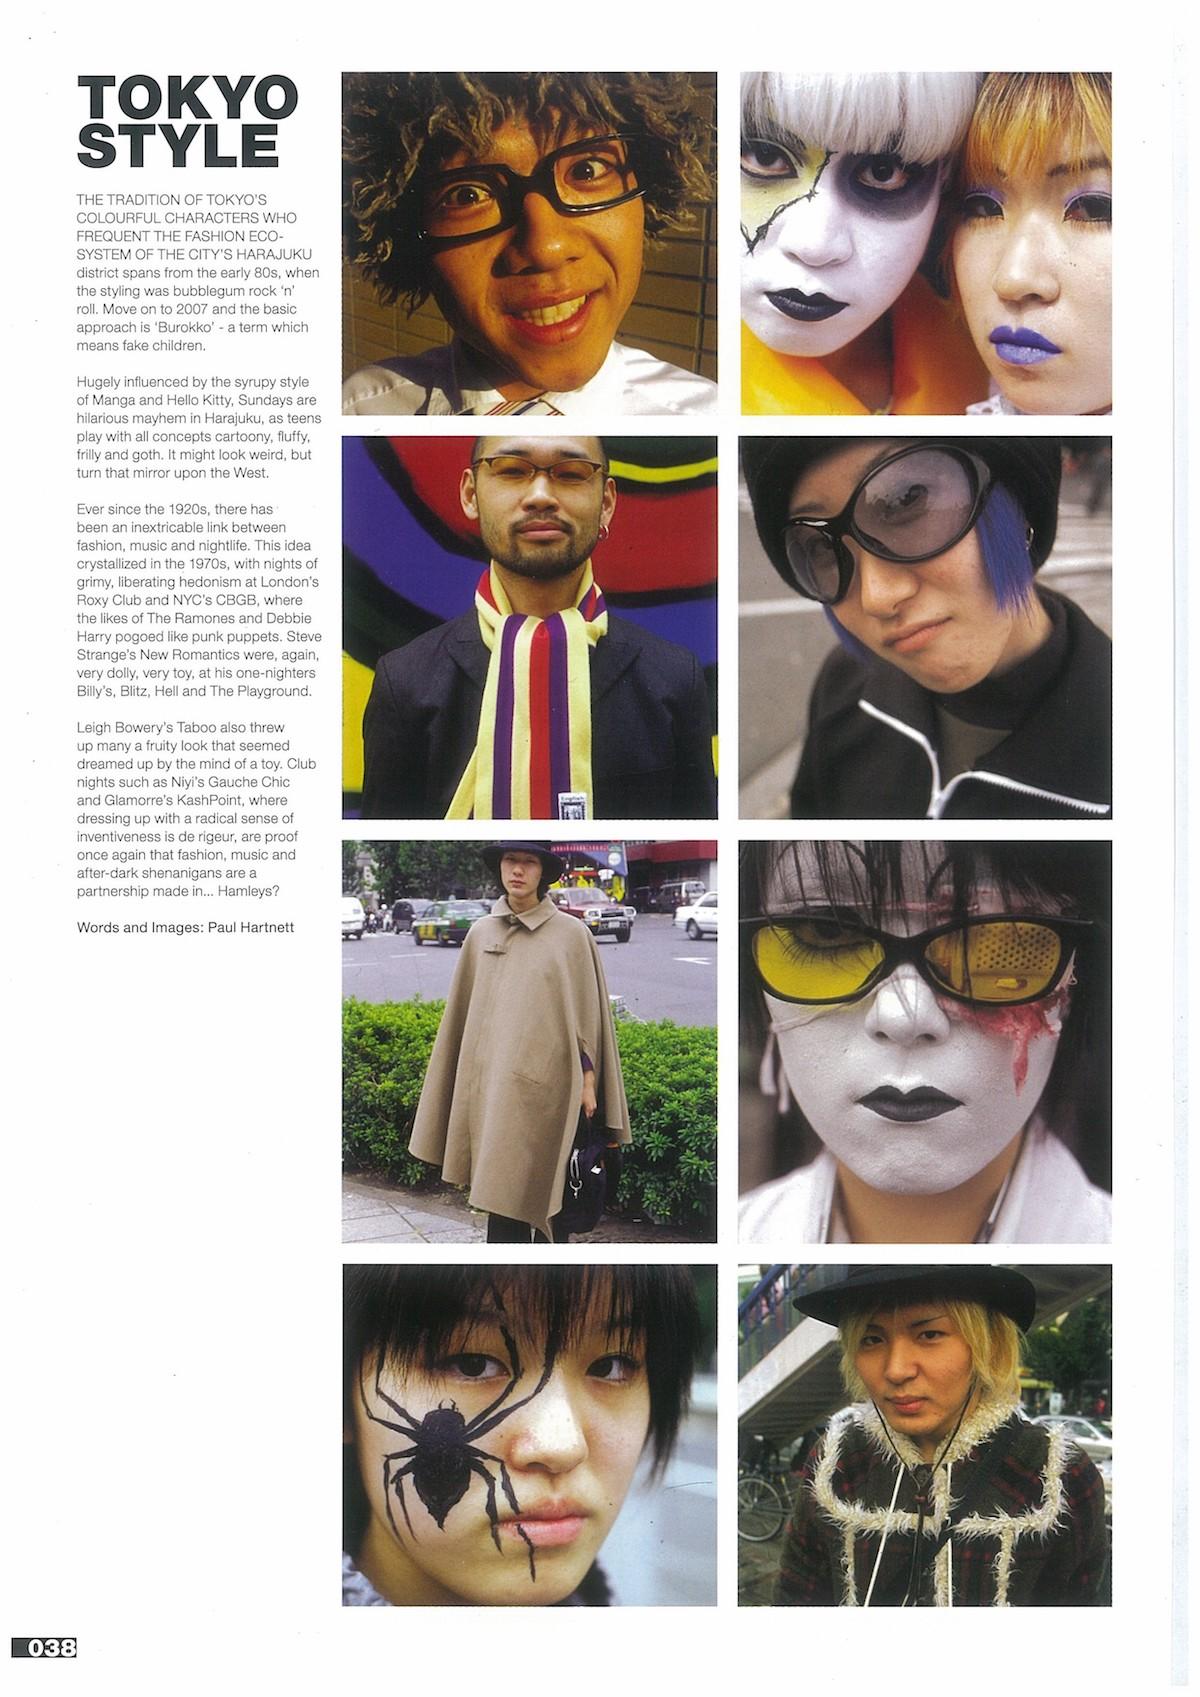 Hartnett_archive_Tokyo_Press_Unravel_Productions_003.jpg